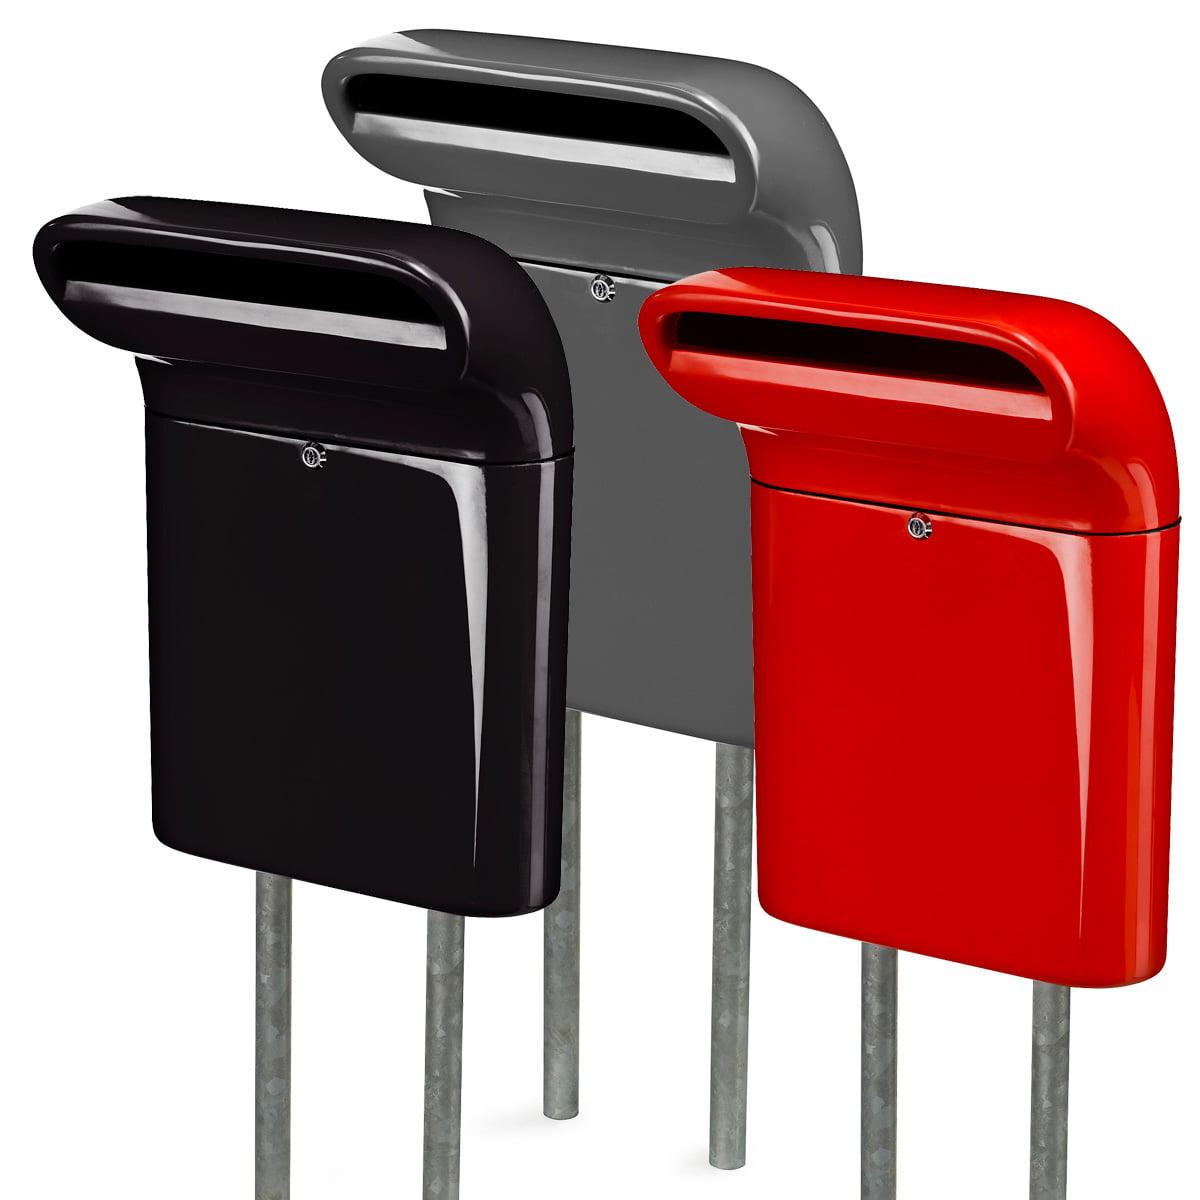 mailbox. Plain Mailbox Born In Sweden  Mailbox S Black Grey Red In